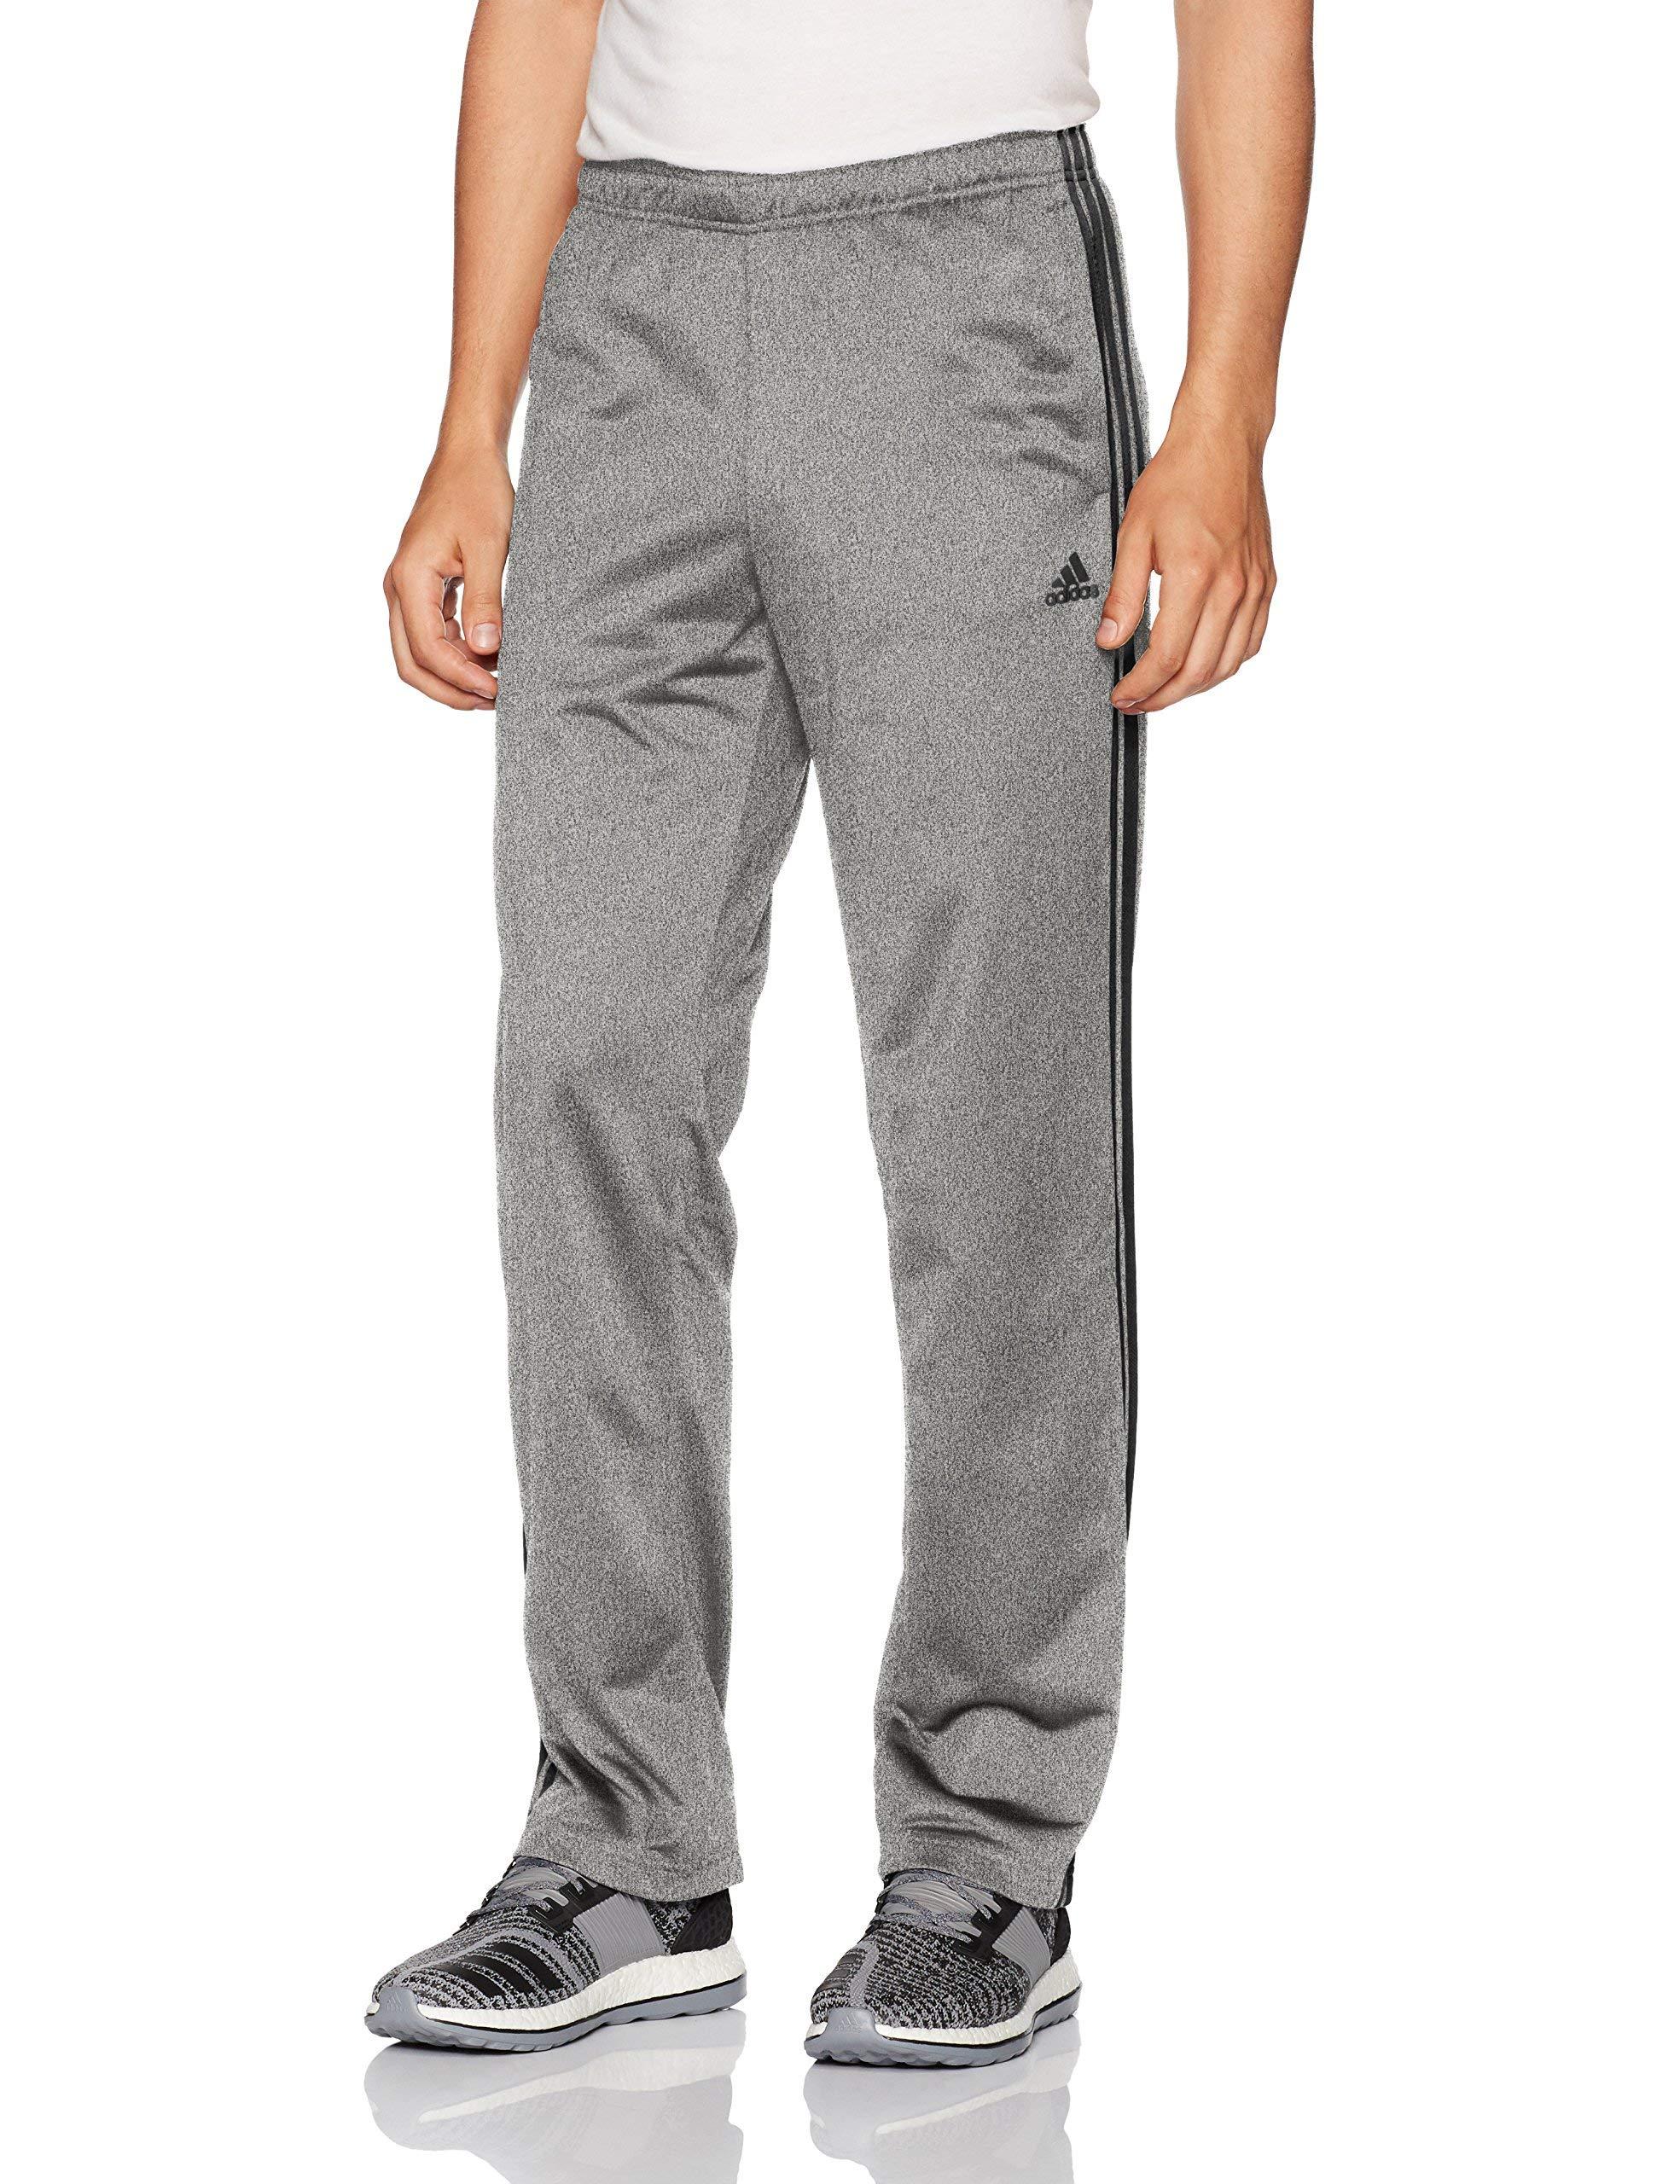 adidas Men's Athletics Essential Tricot 3-Stripe Pants, Dark Grey/Black, Large by adidas